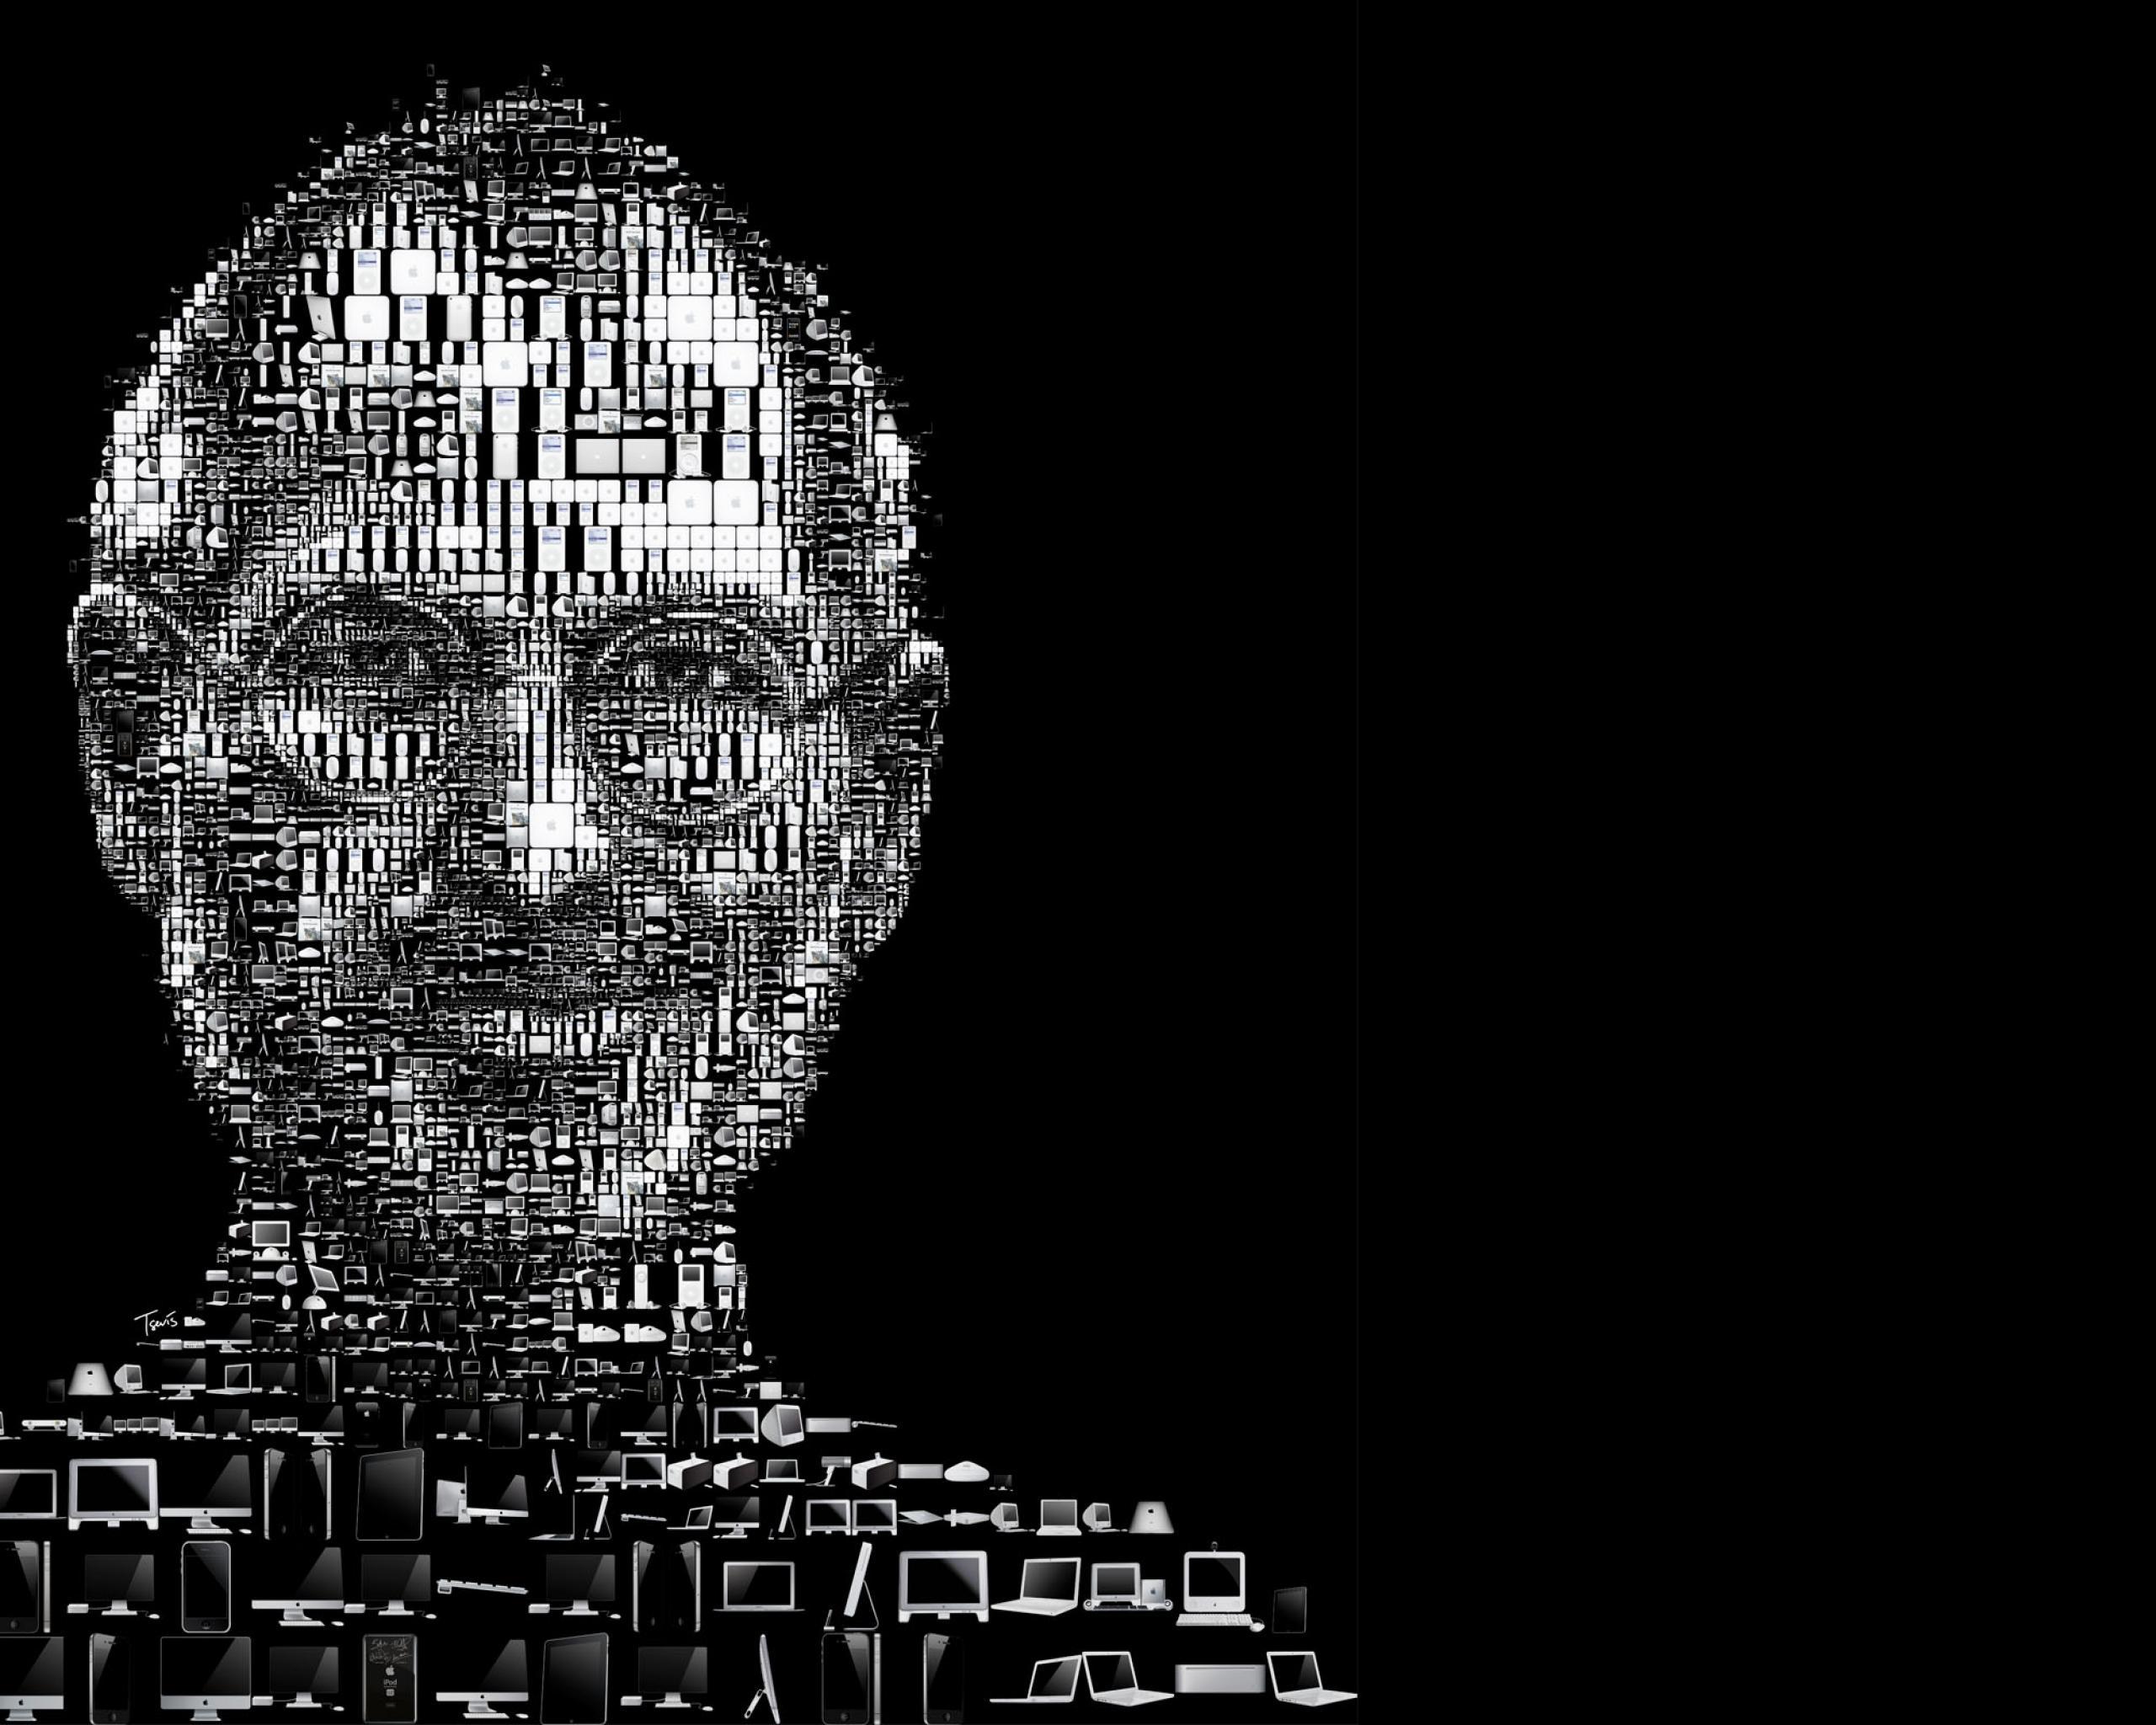 Mac-Apple-Steve-Jobs-2048x2560